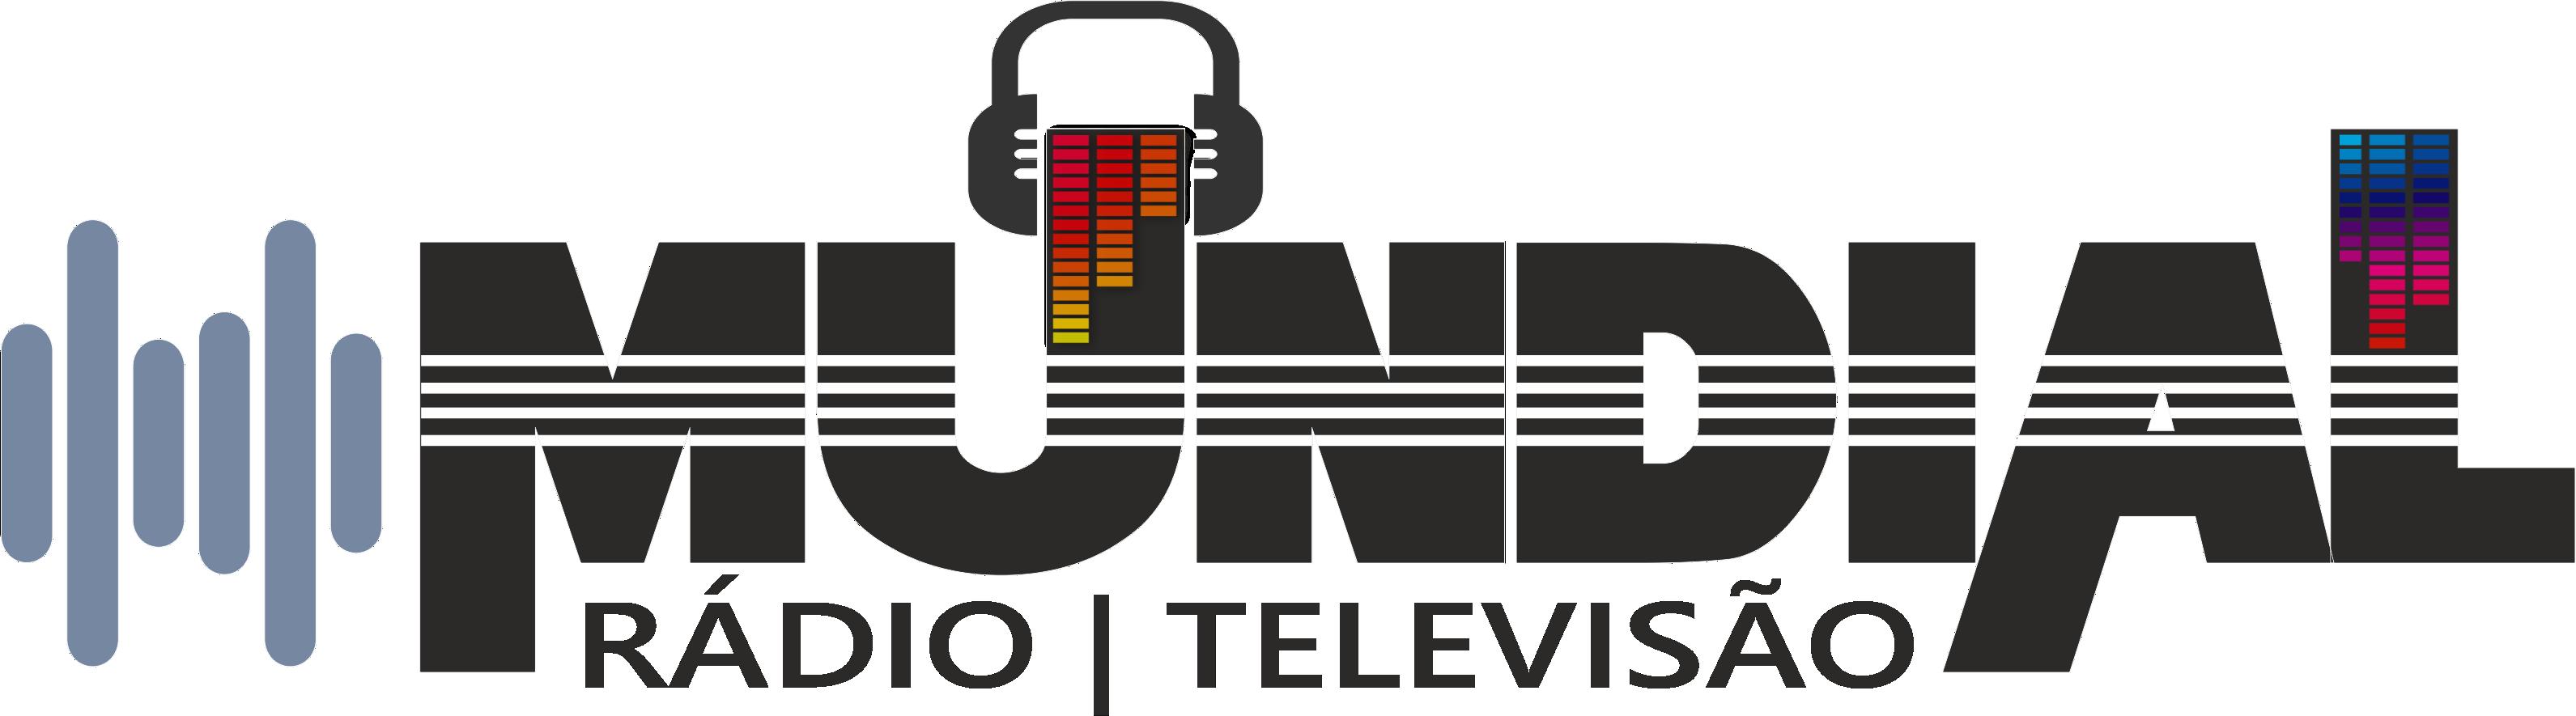 MundialFM - Radio e TV